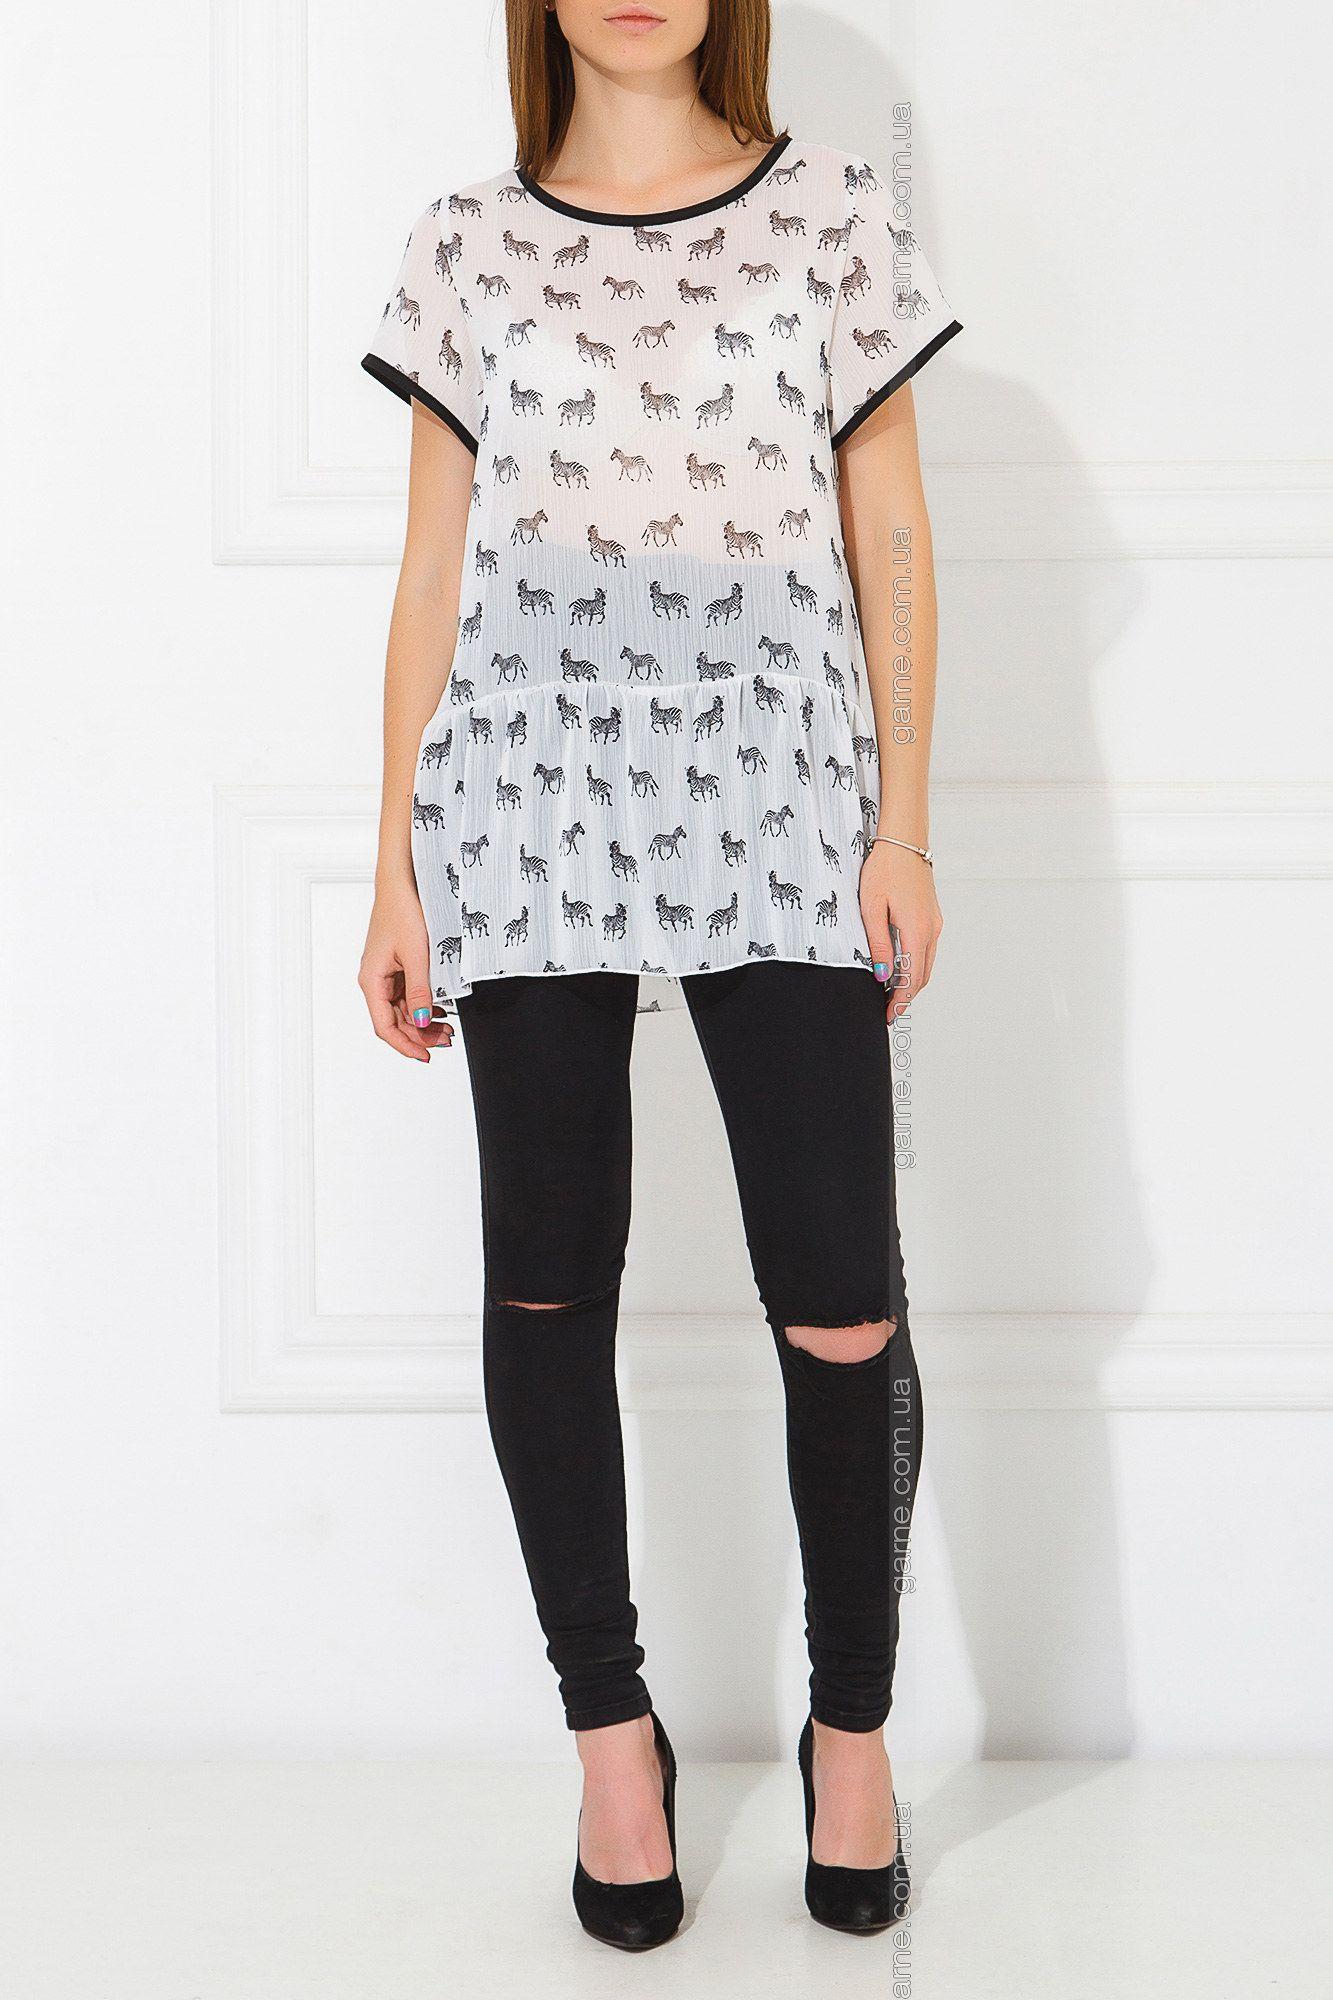 Блуза Zebra. Блузы, рубашки: Garne - артикул: 3030334.